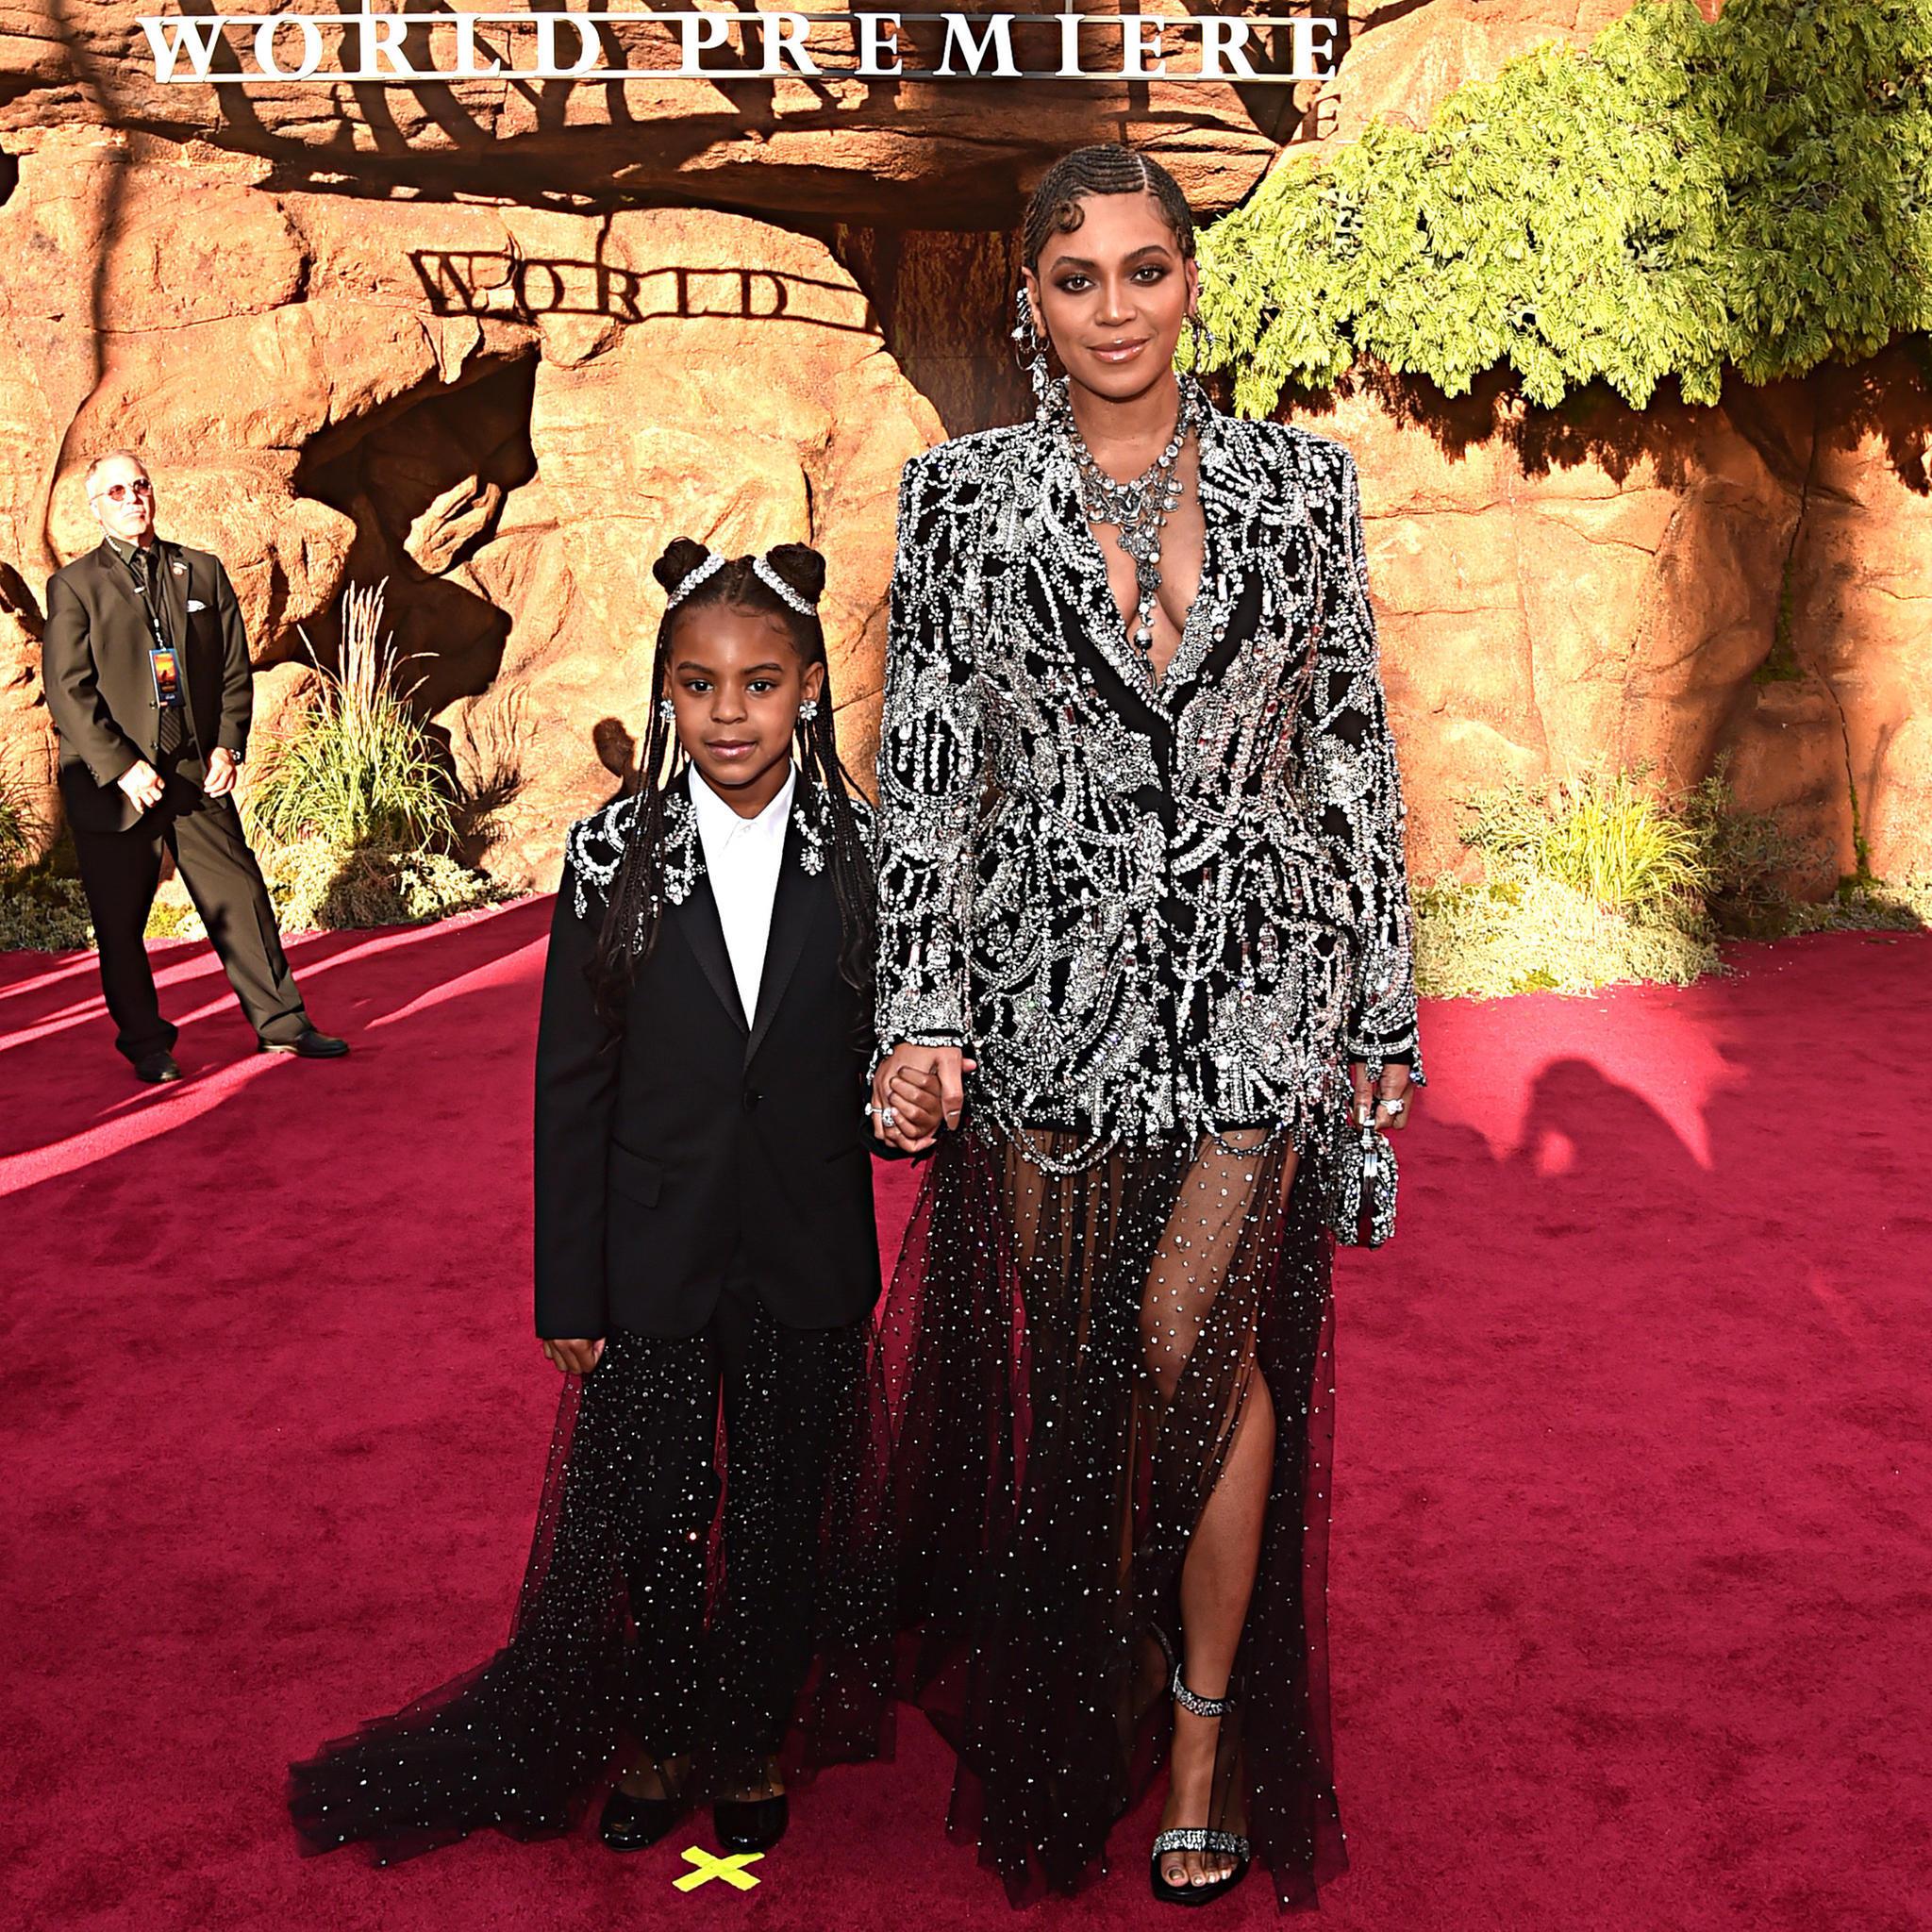 Ivy Blue Carter und Beyoncé Knowles